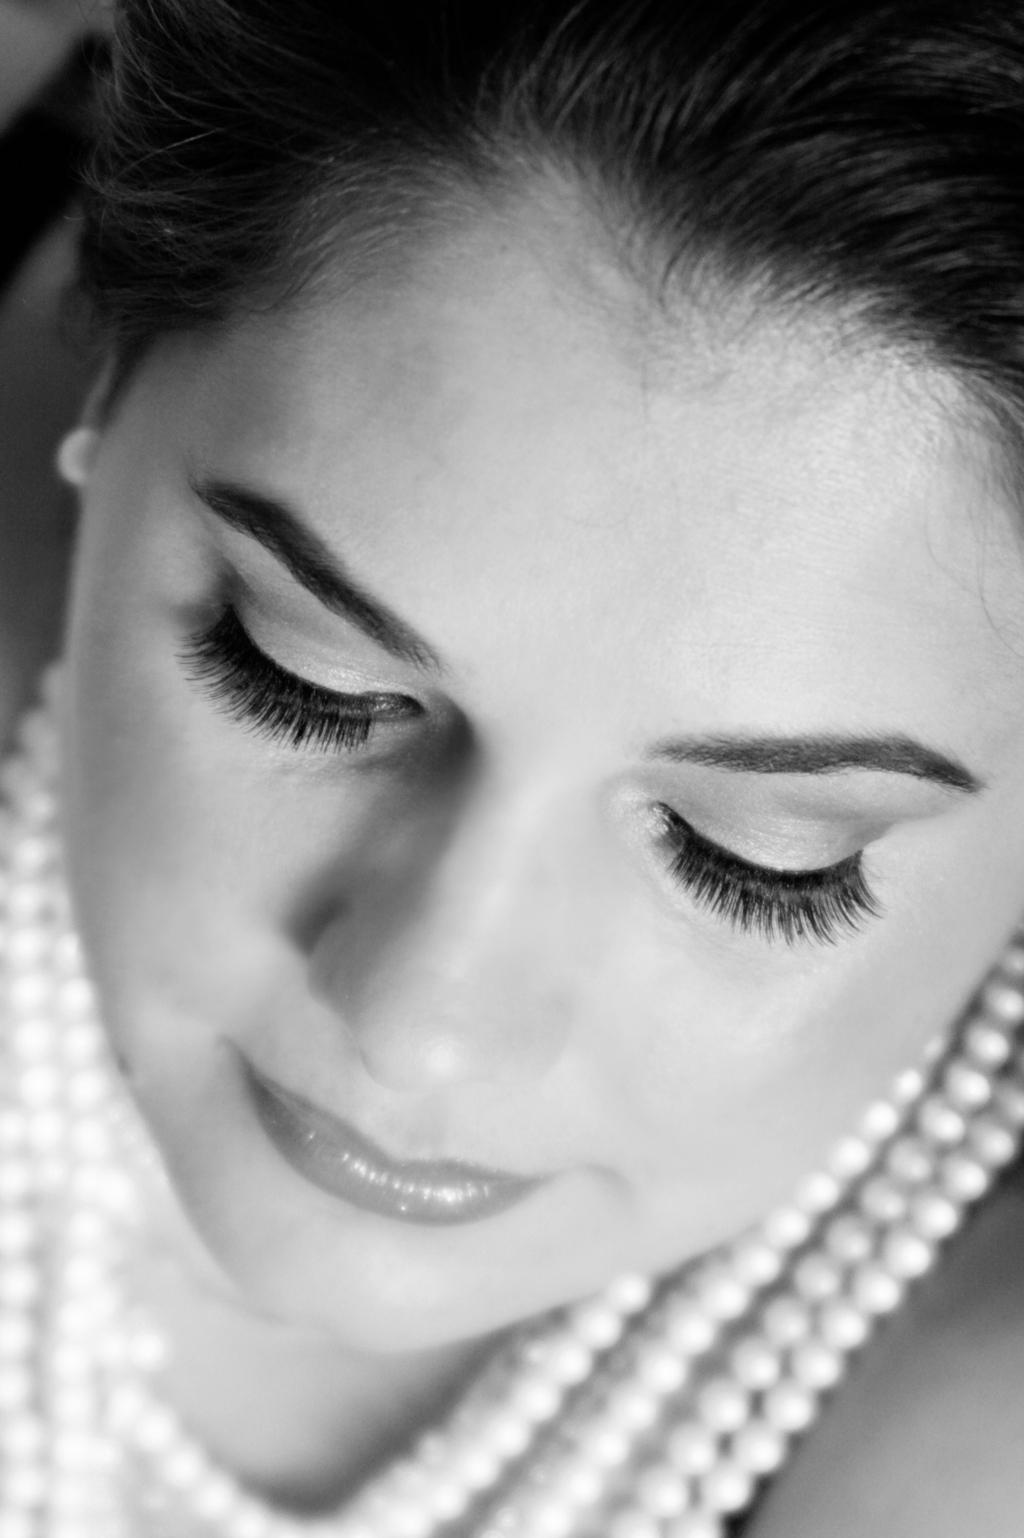 False-eyelashes-bridal-makeup-tips-tricks-advice.full